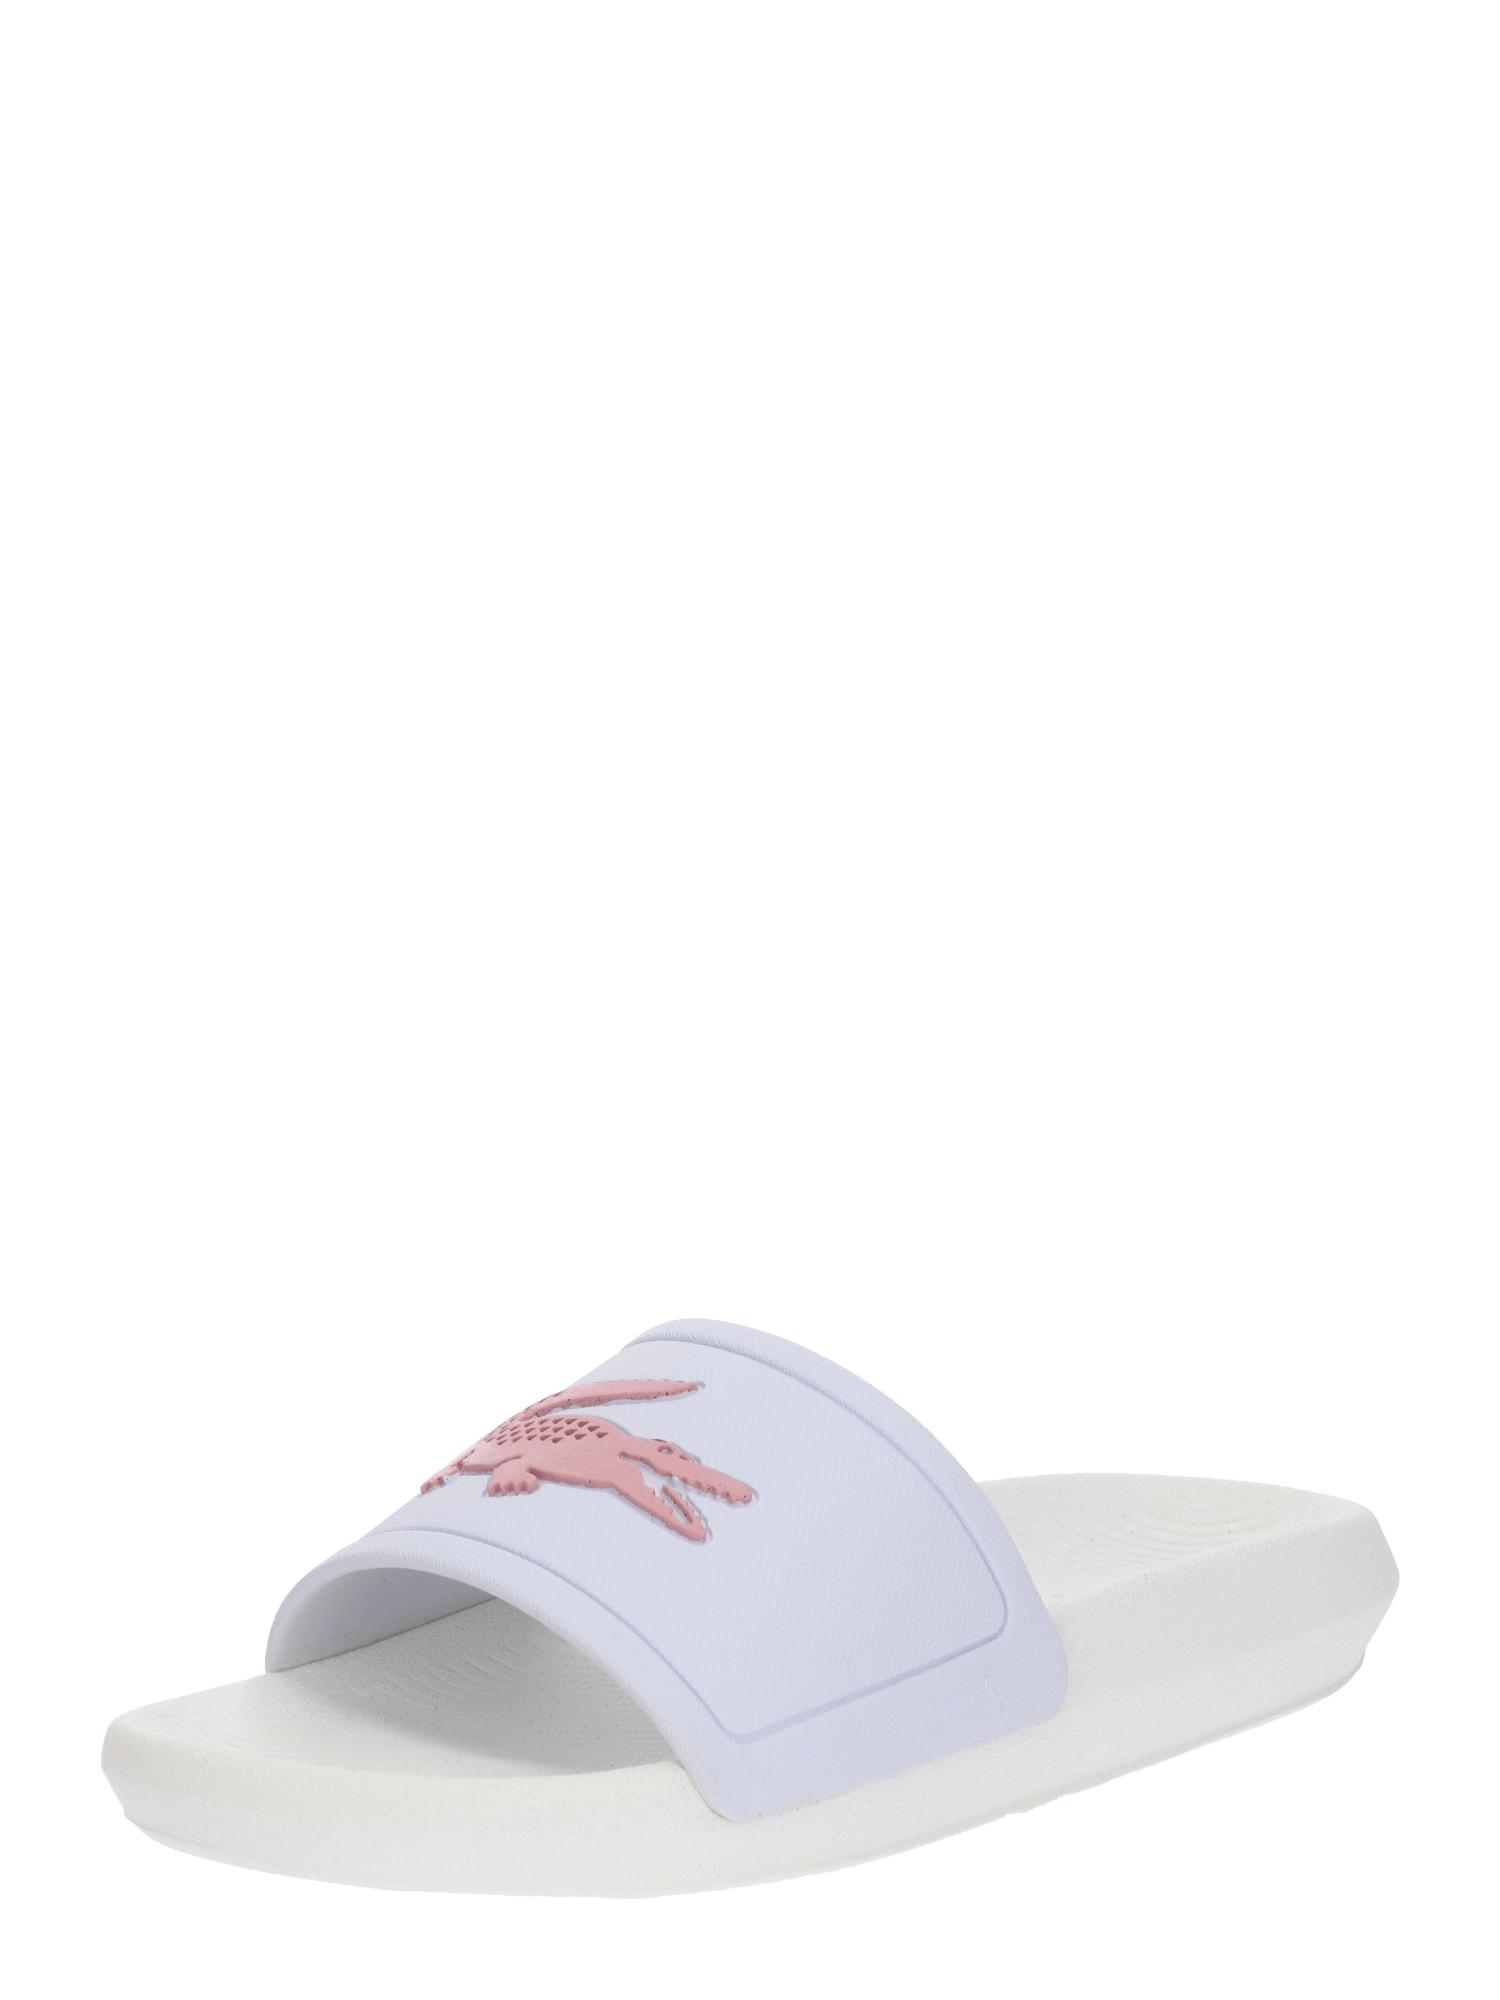 Pantofle Croco Slide růžová bílá LACOSTE